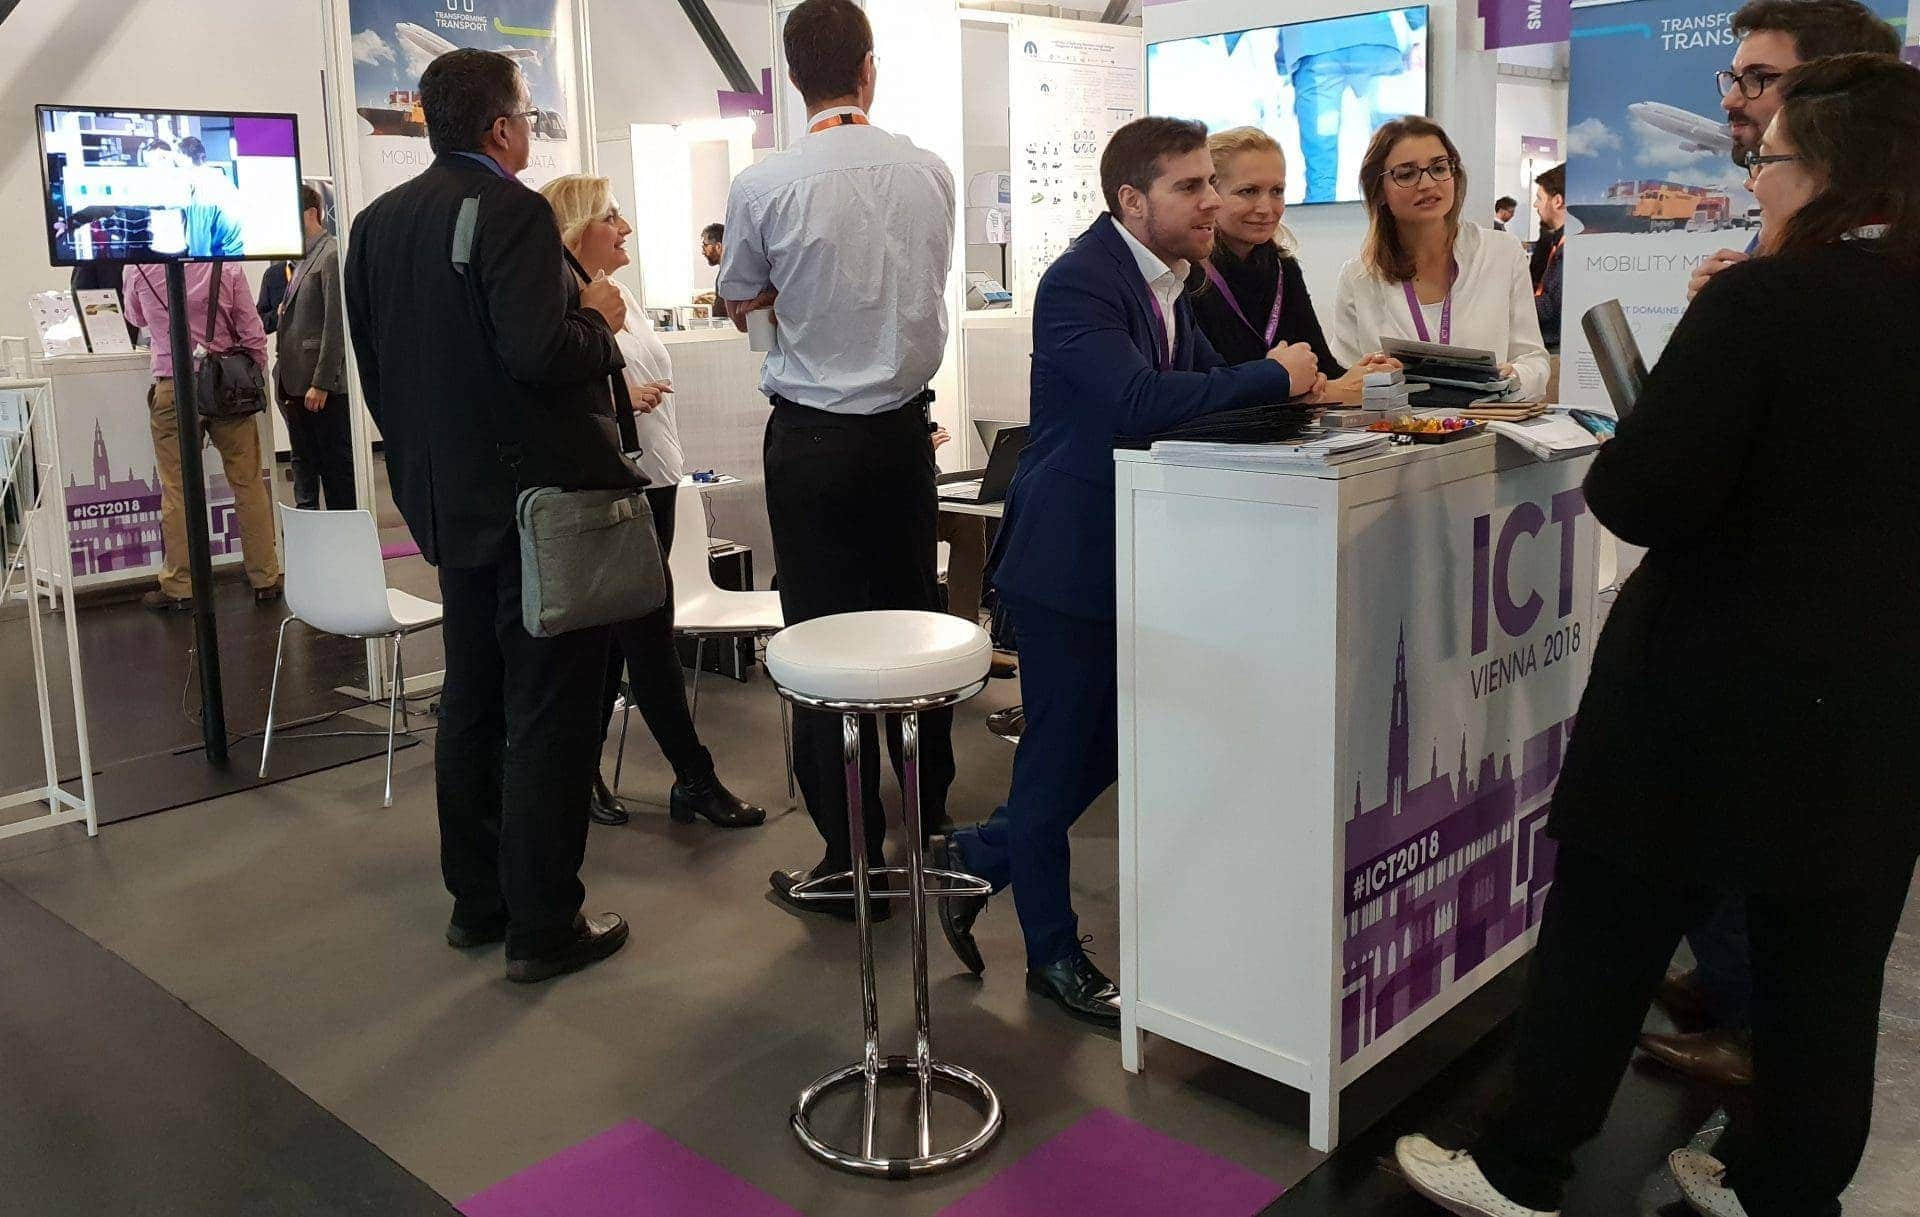 ICT 2018 Stand